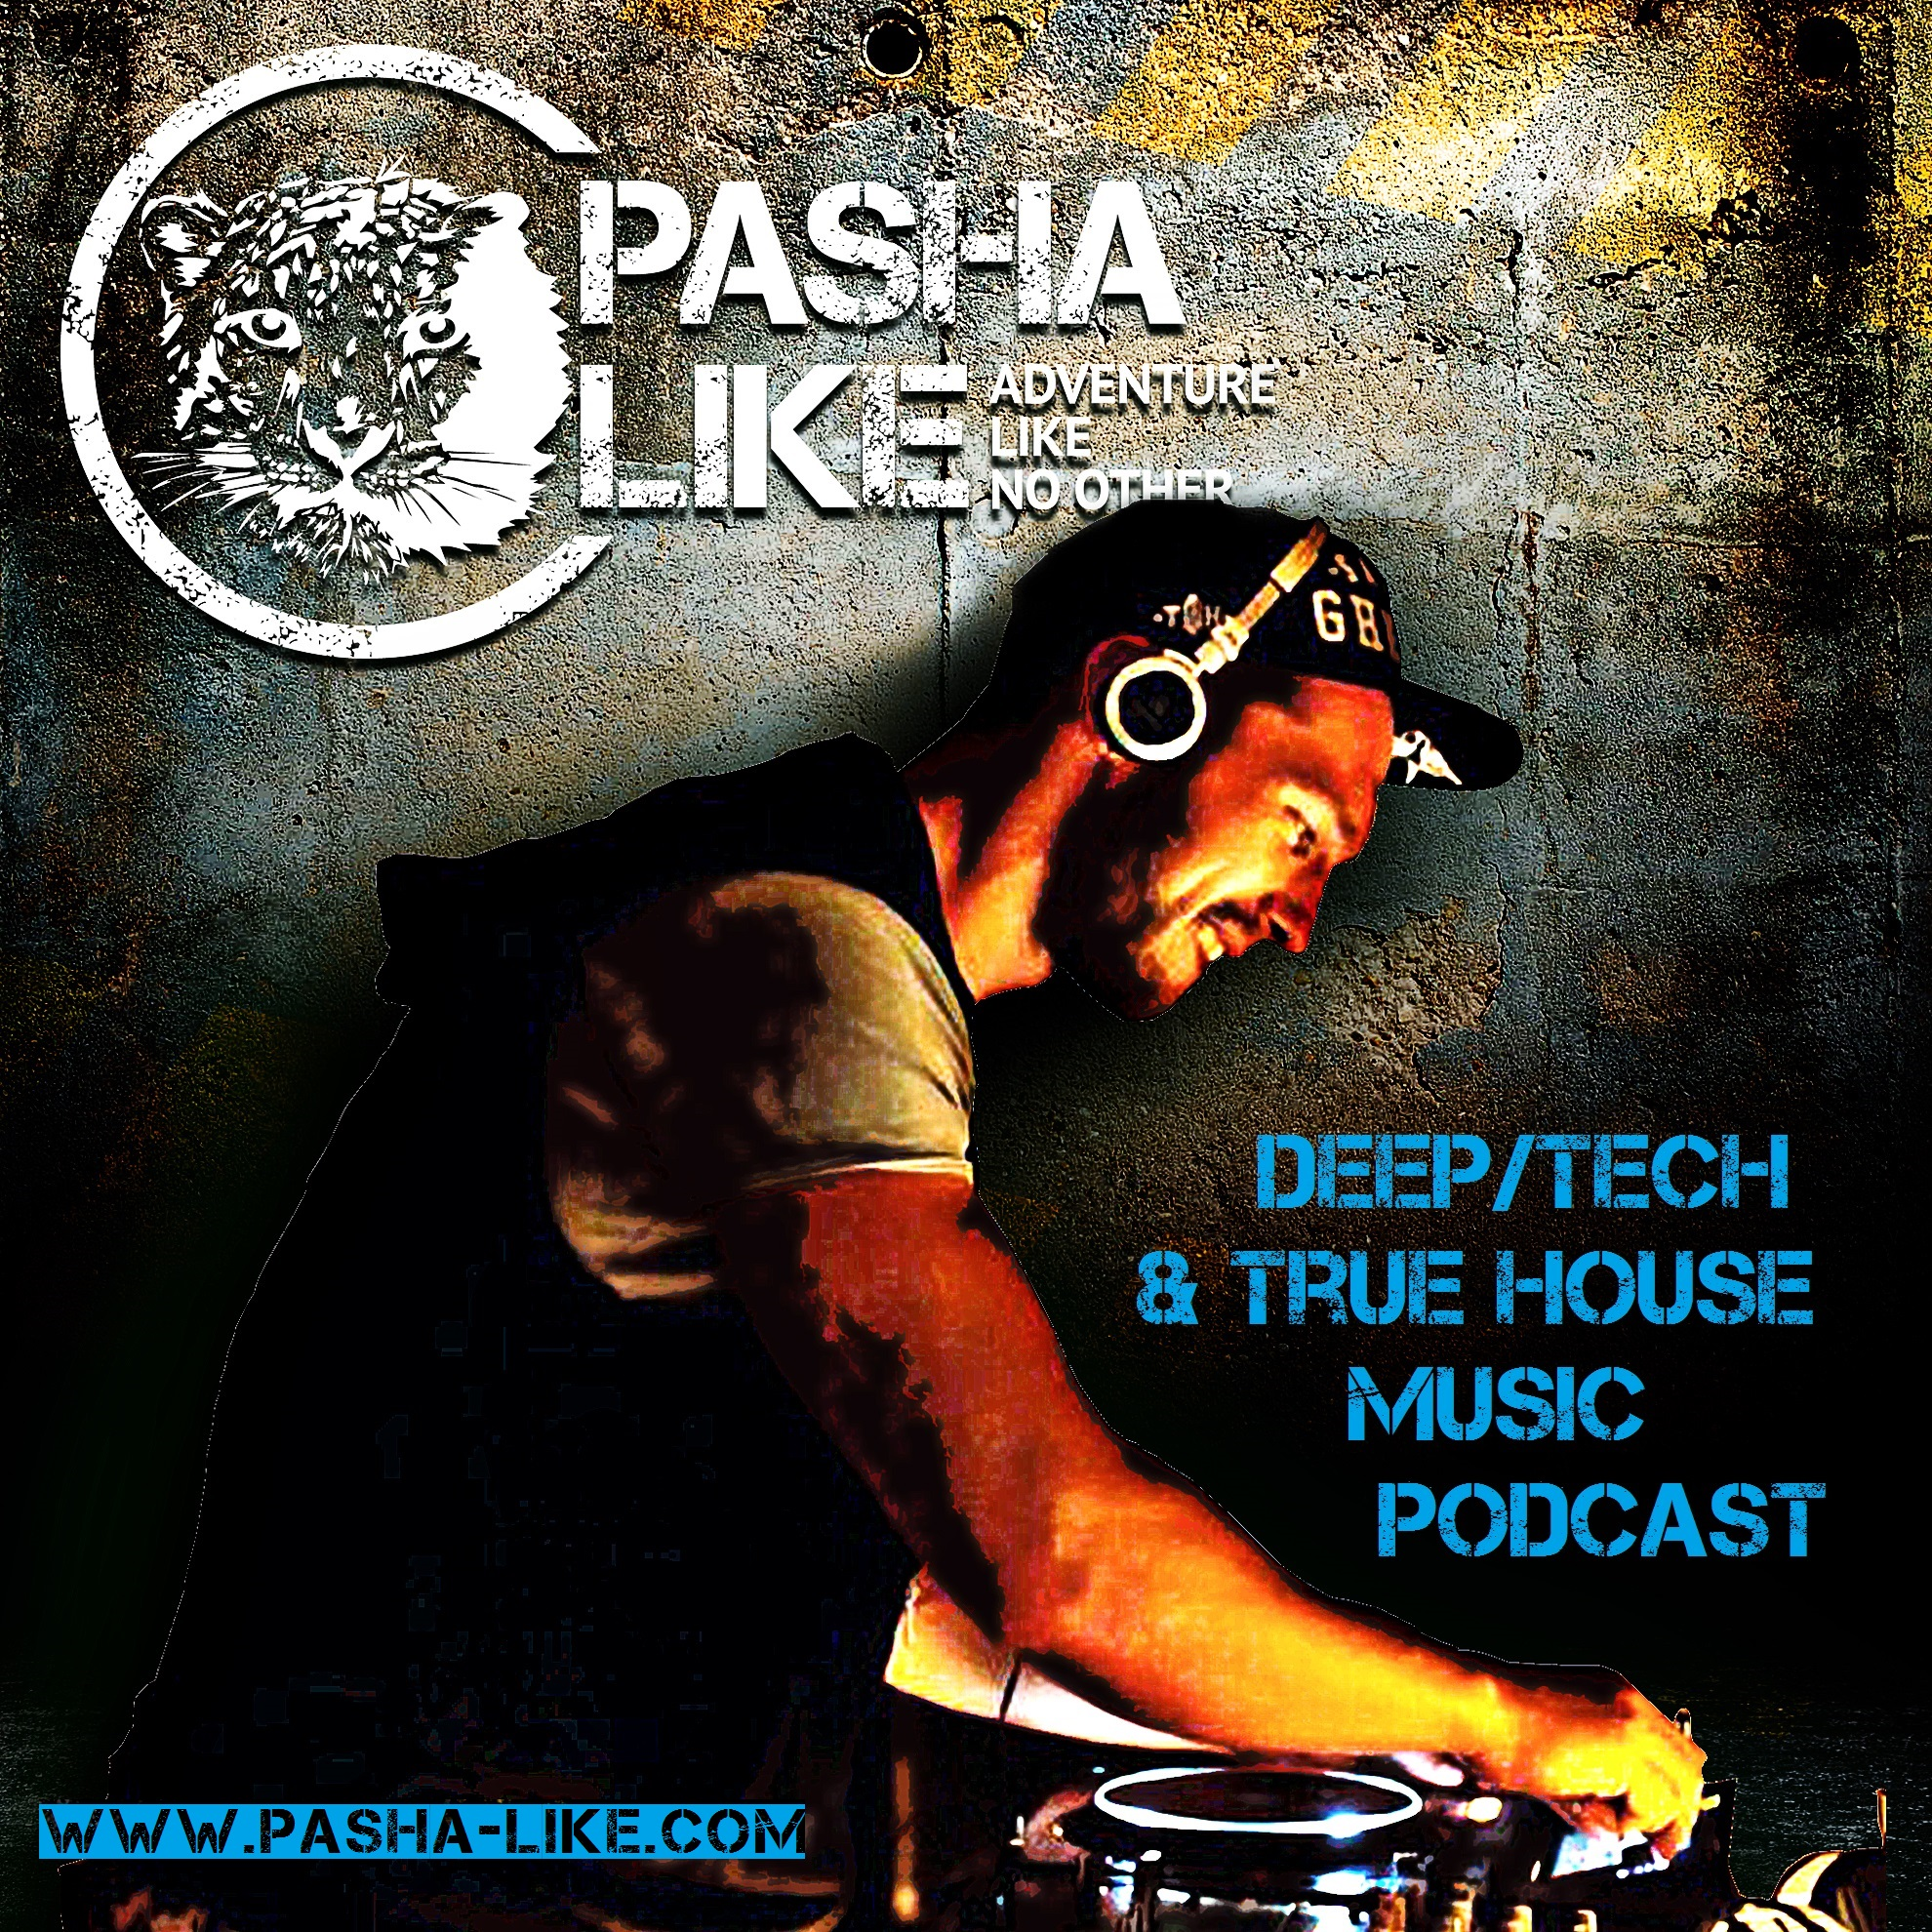 Starting next week: deep, techno & tech-house music with